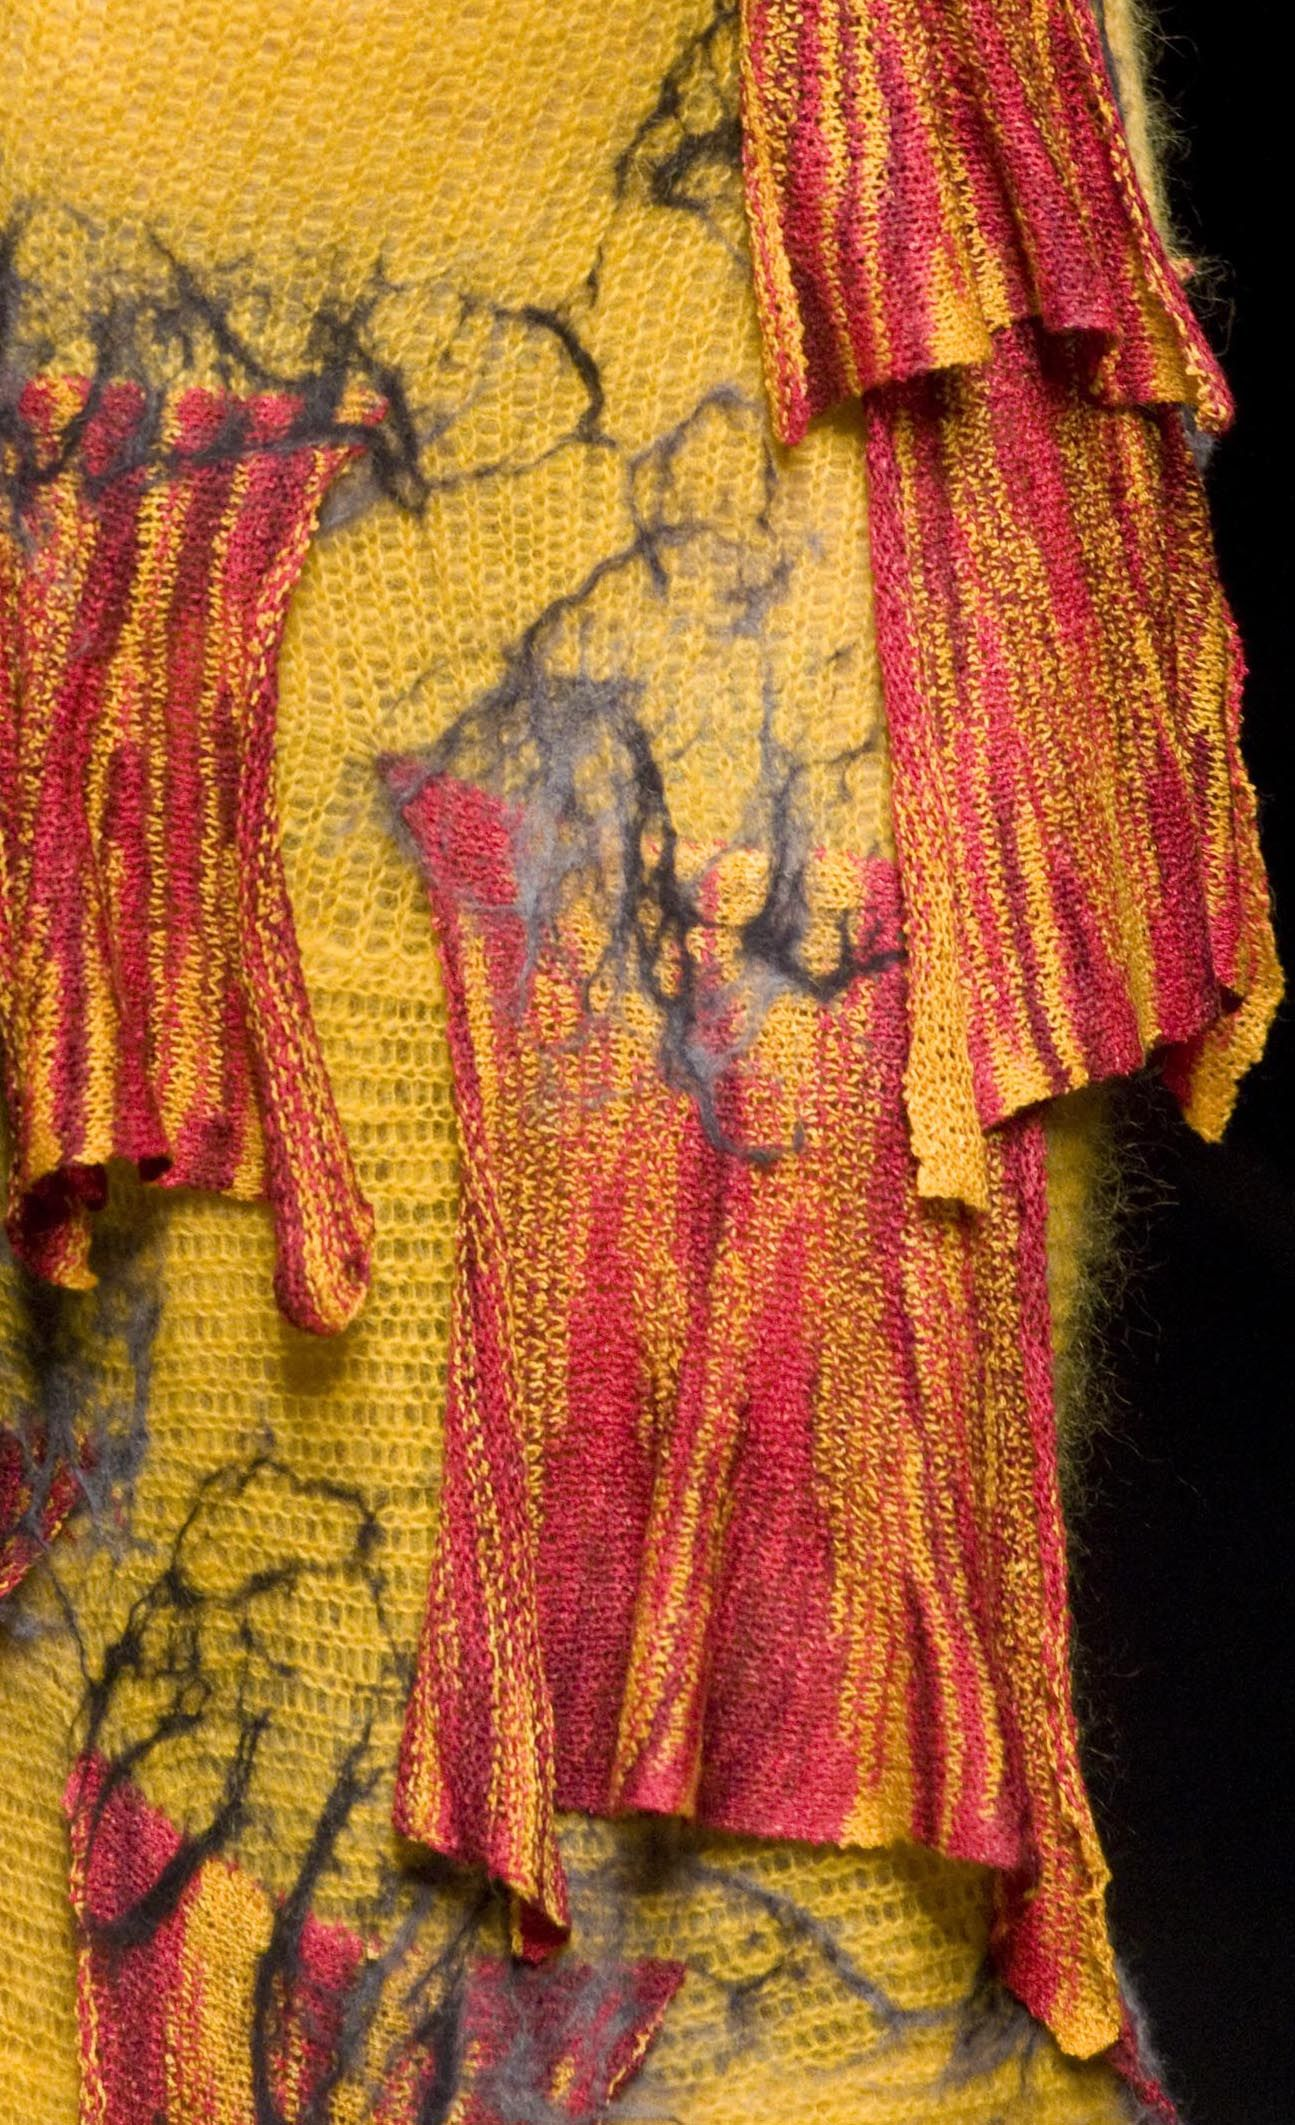 Texture By Asta Masiulyte At Coroflot Com Weaving Art Texture Textile Artists